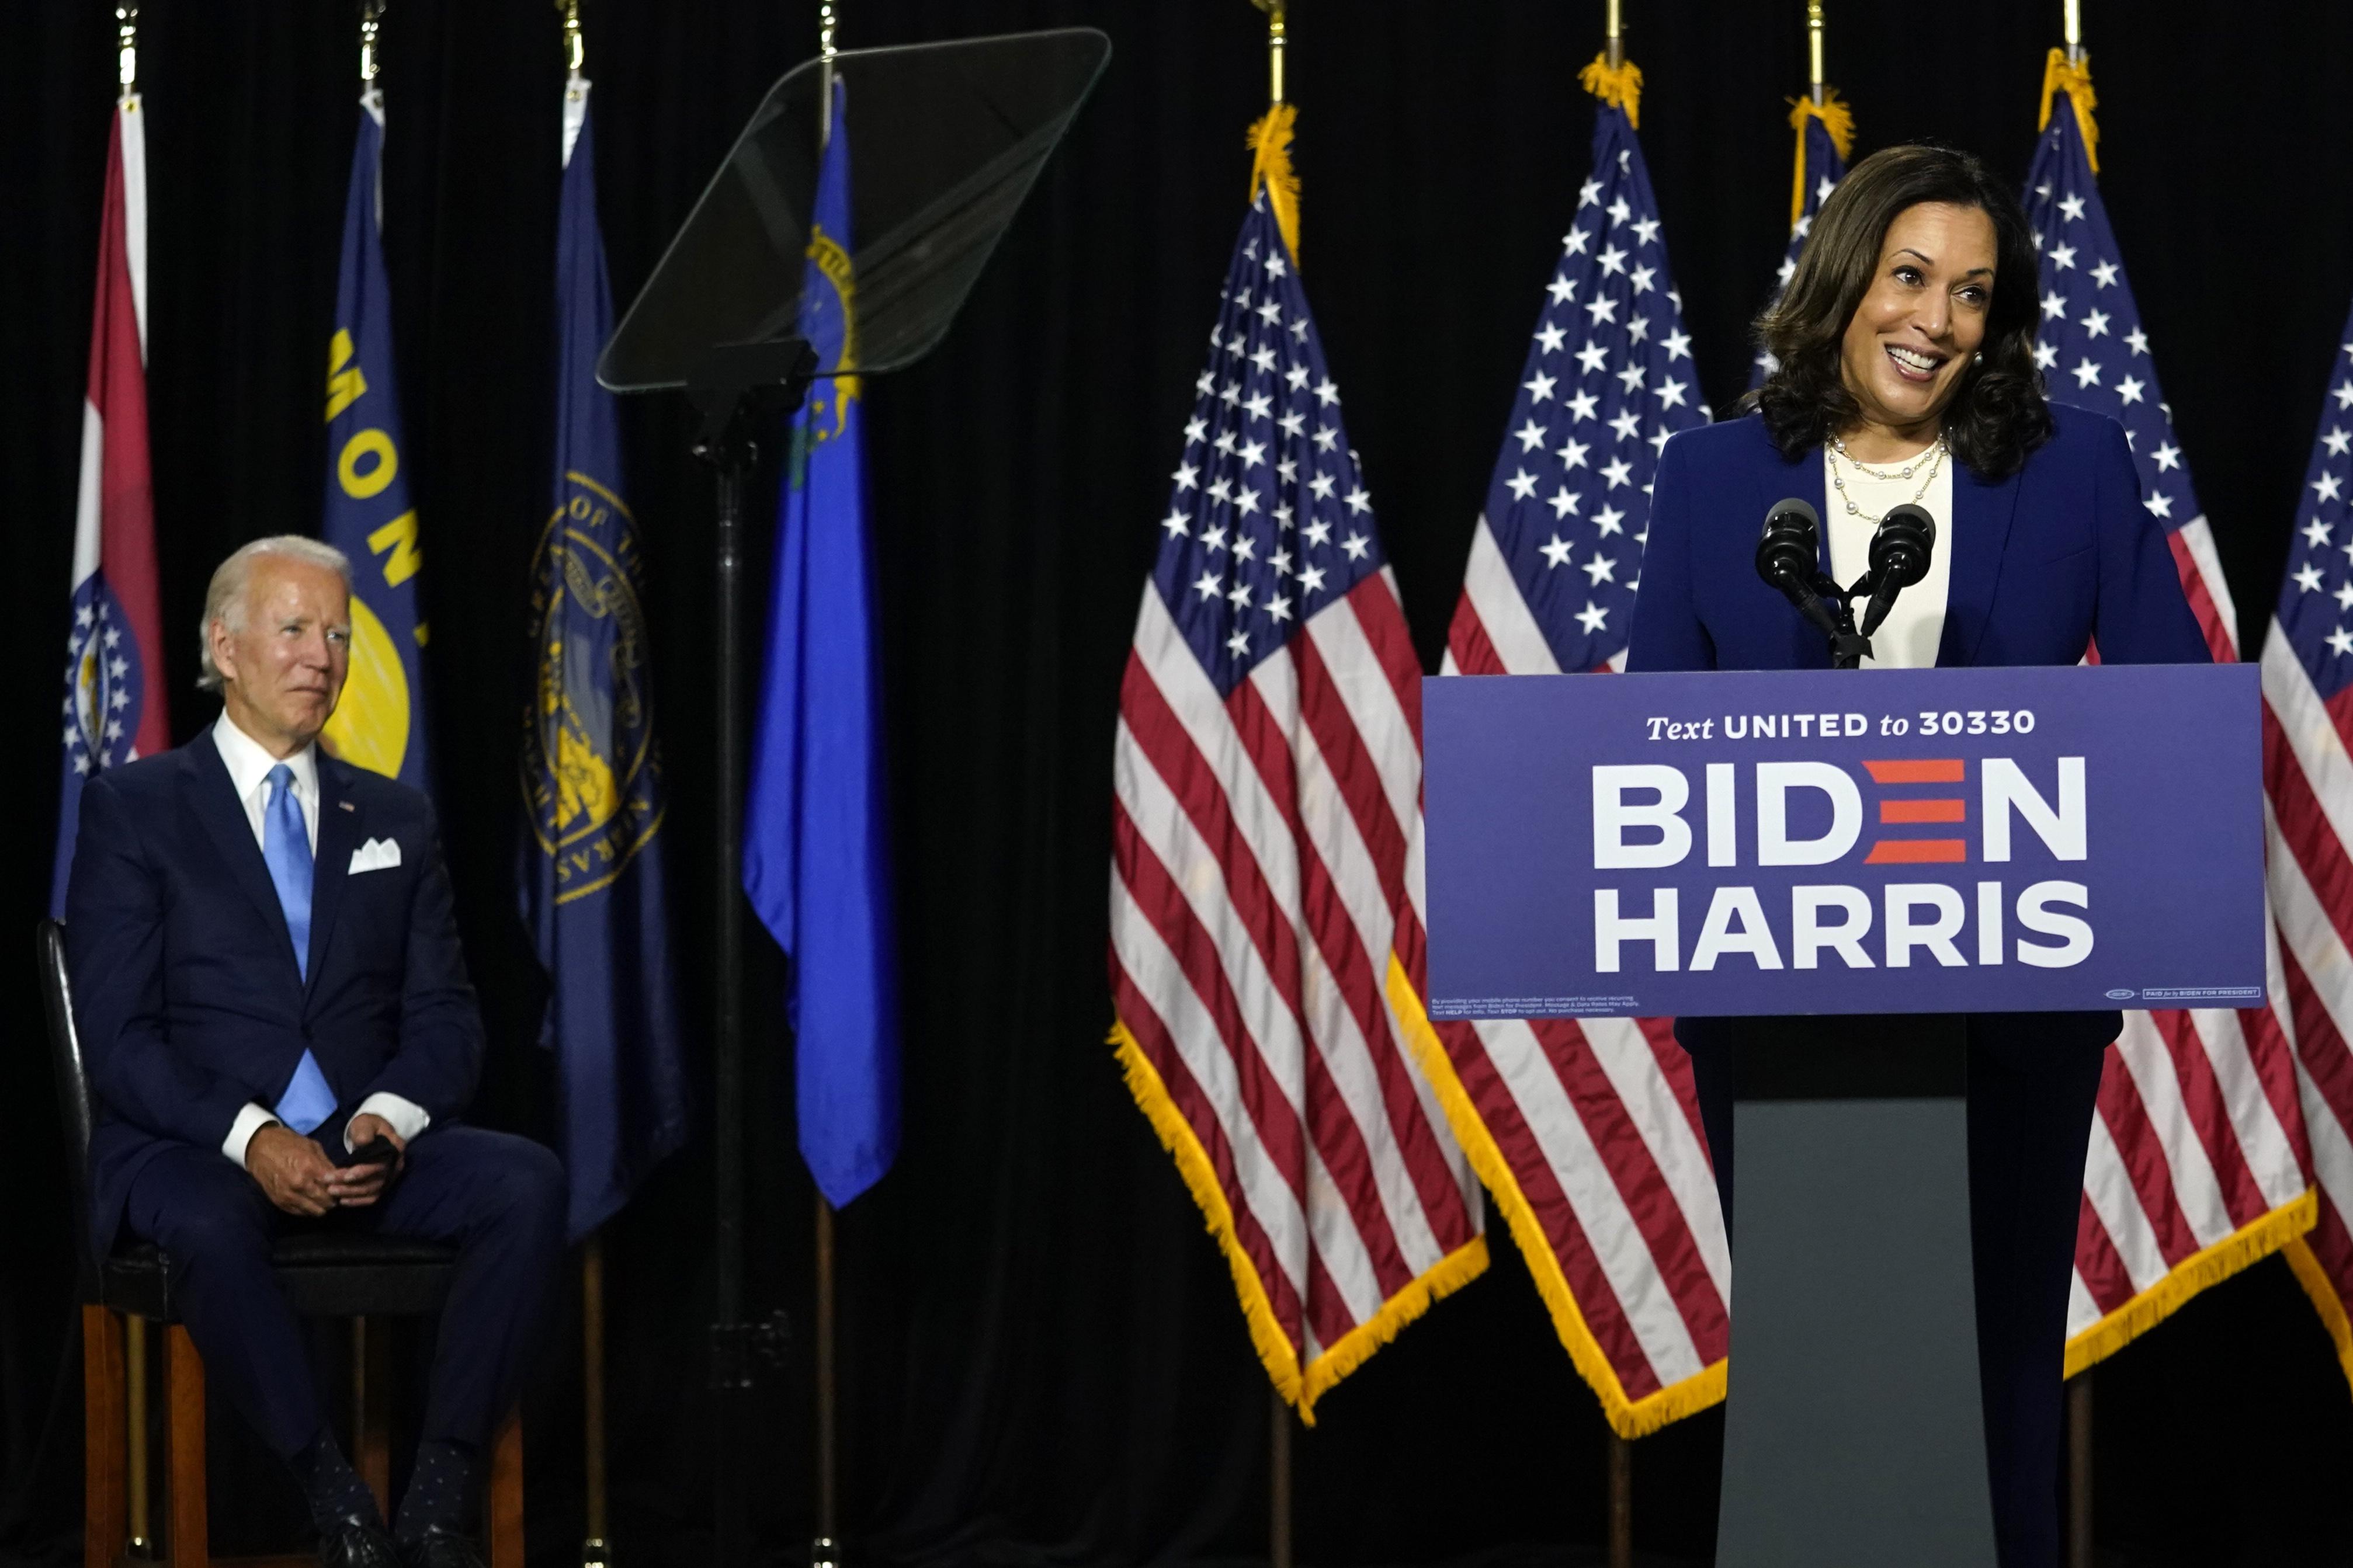 Kamala Harris Joe Biden Align On Return To Obama Era Foreign Policy Washington Times